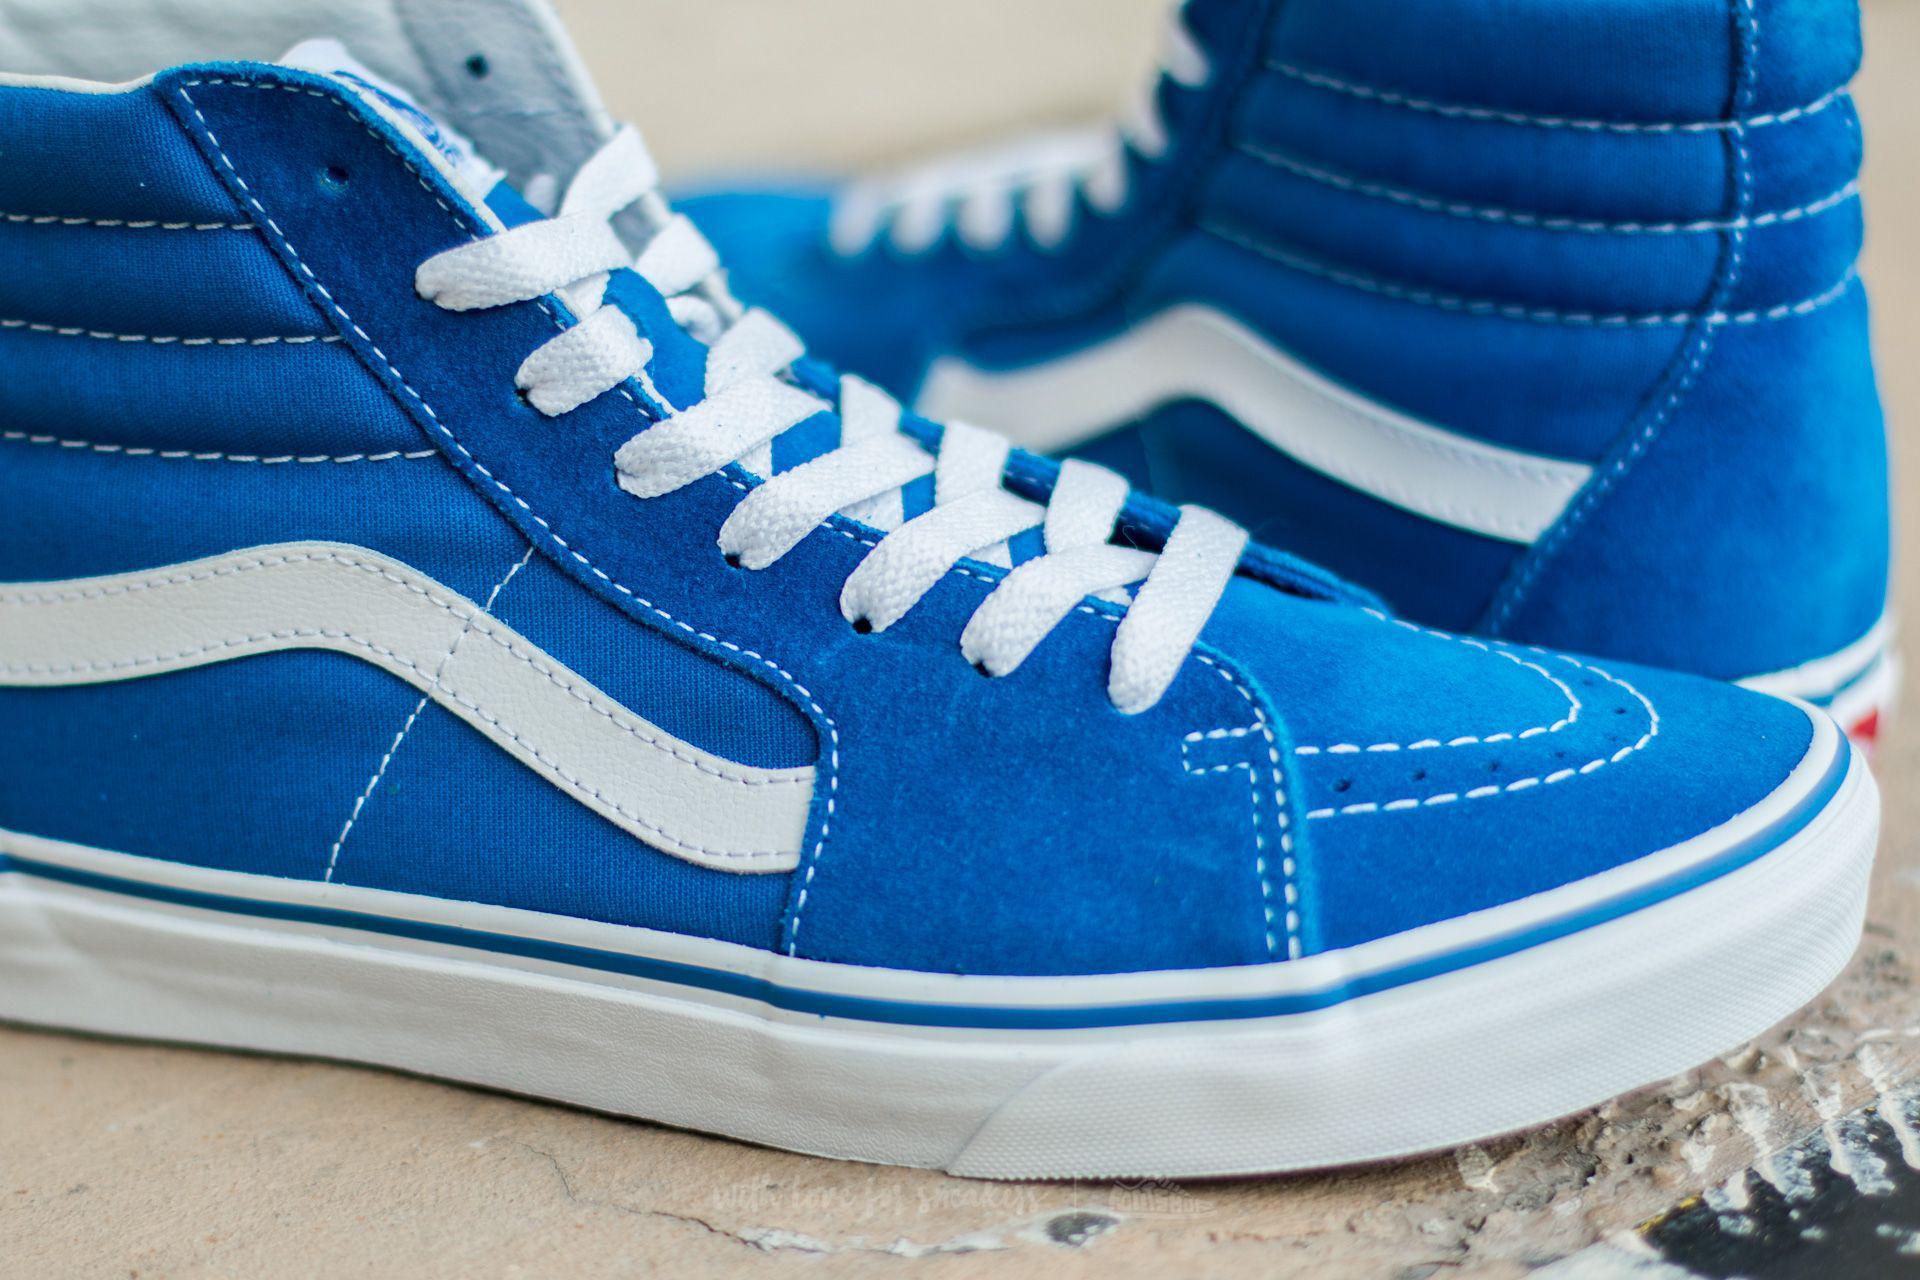 fc3548b6dee18 Vans Sk8-hi (suede/canvas) Imperial Blue in Blue for Men - Lyst